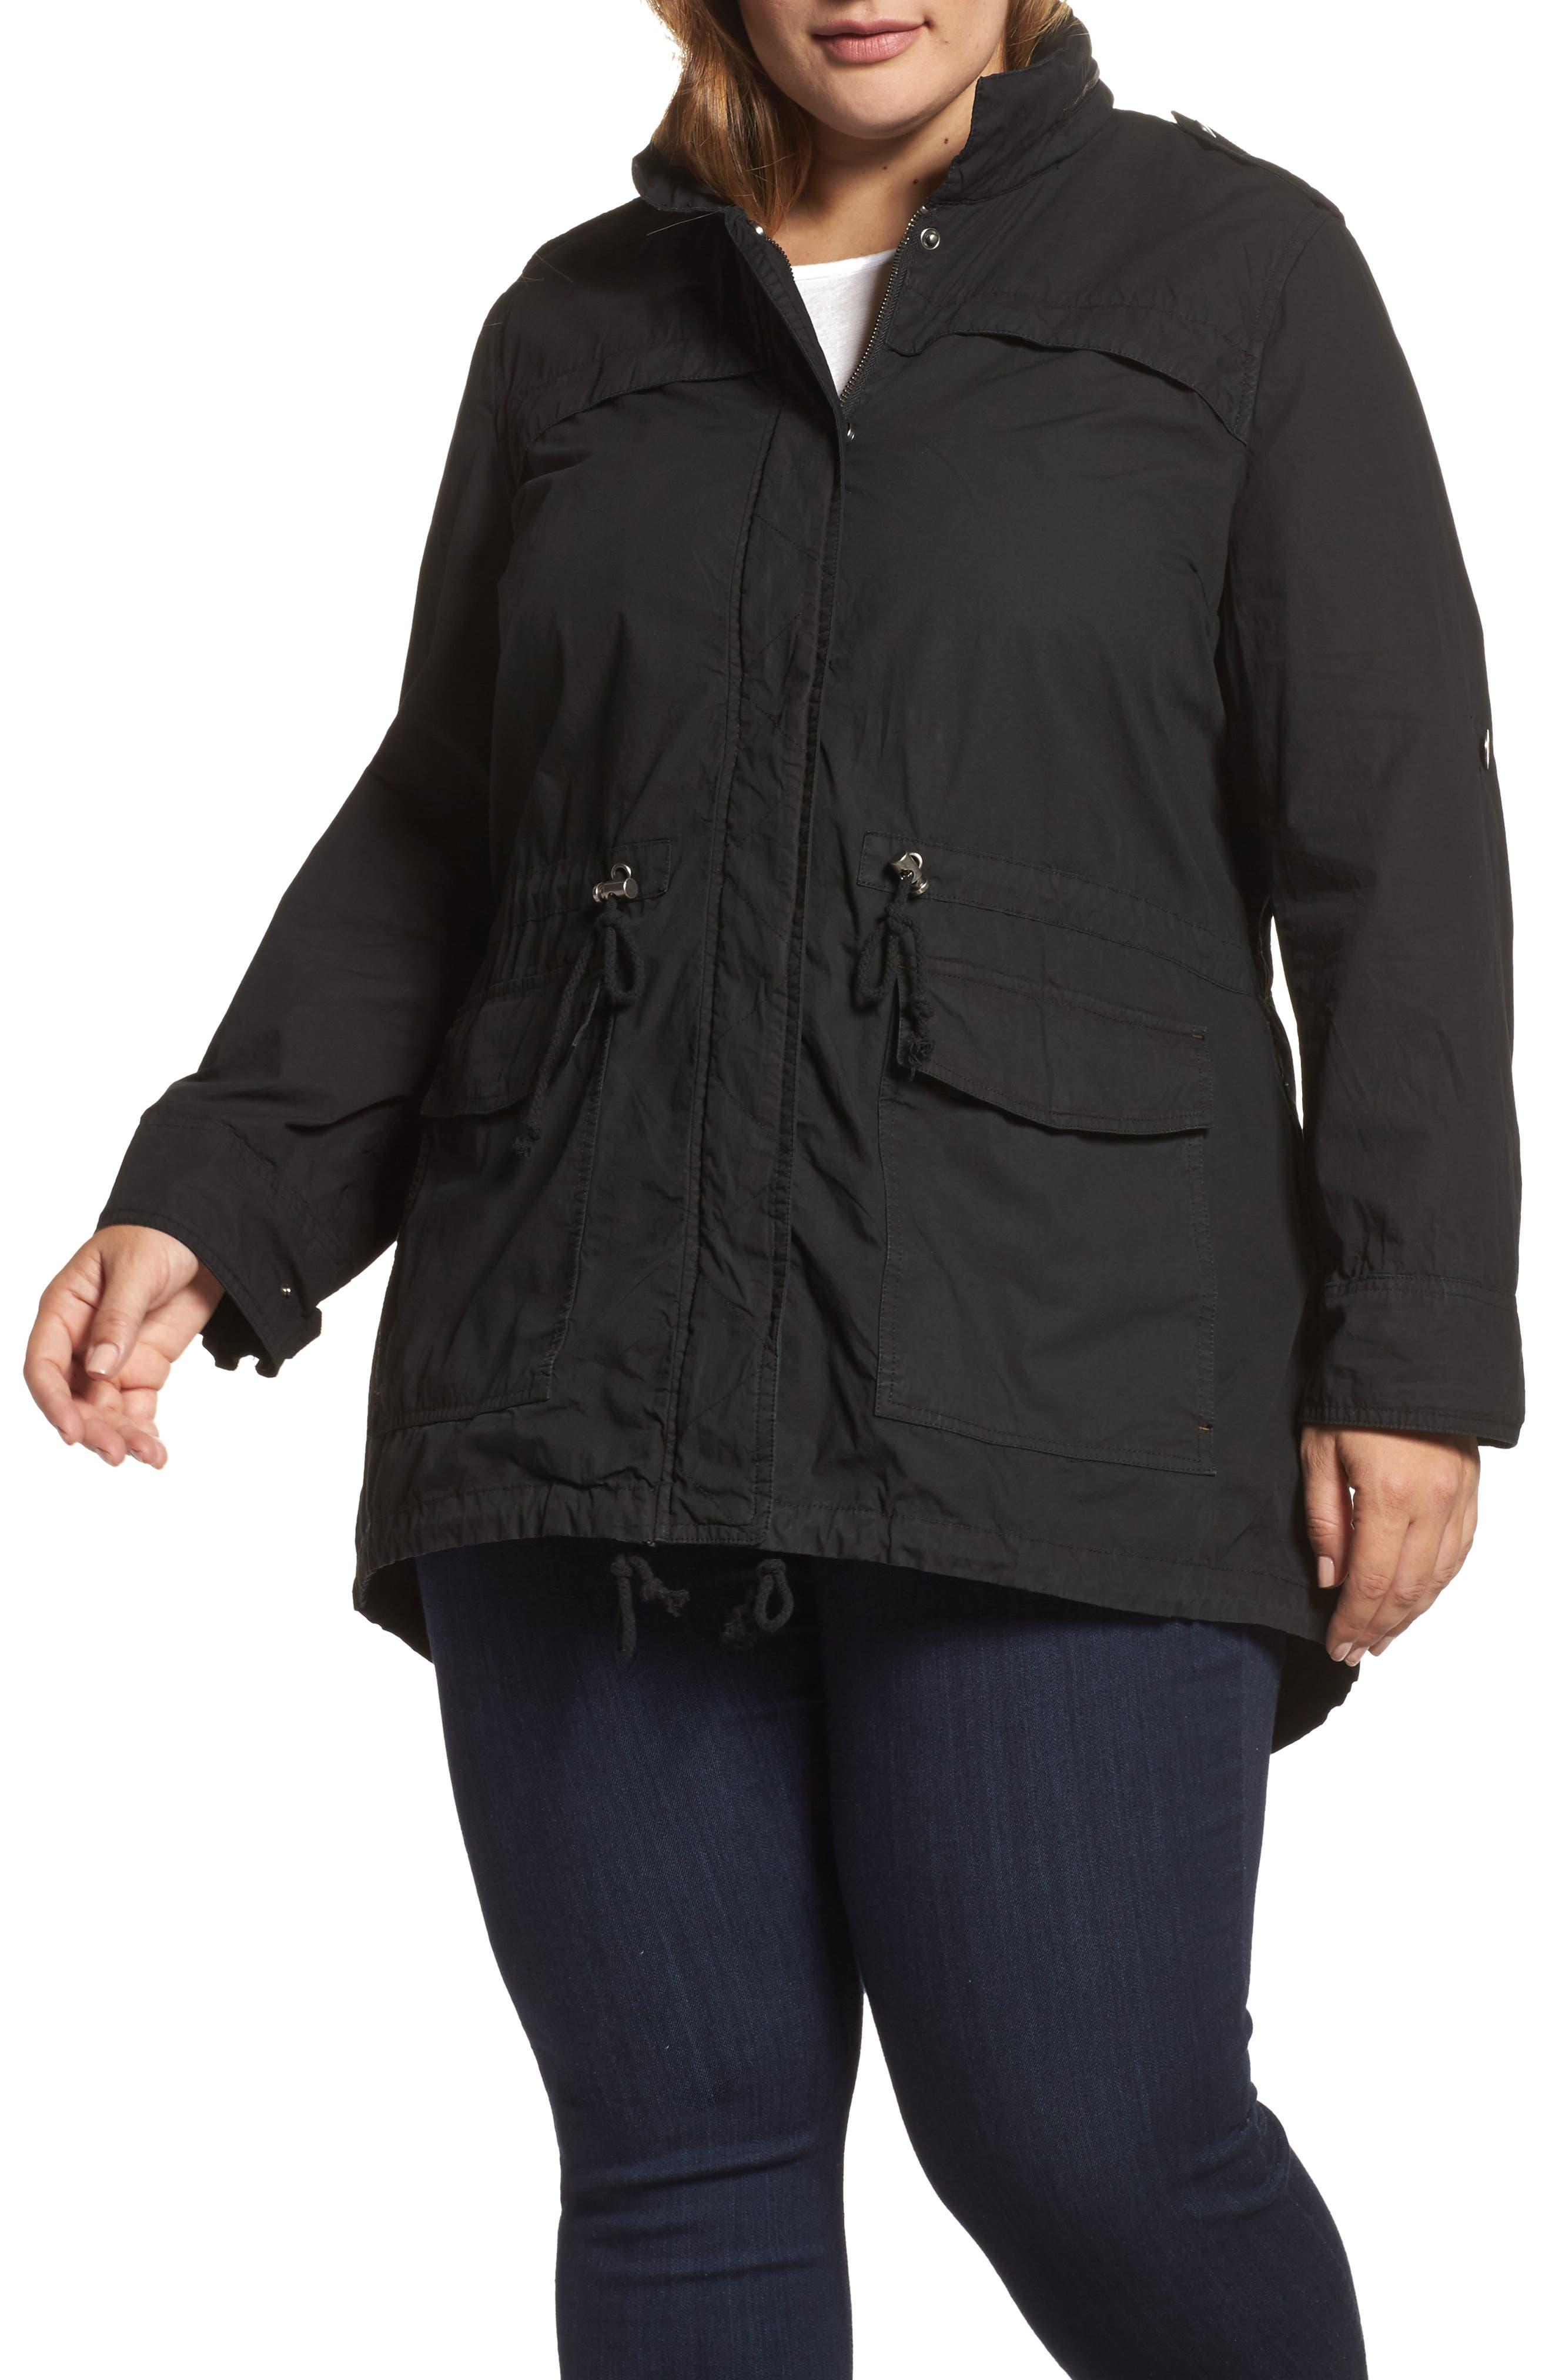 Main Image - Levi's® Parachute Hooded Cotton Utility Jacket (Plus Size)